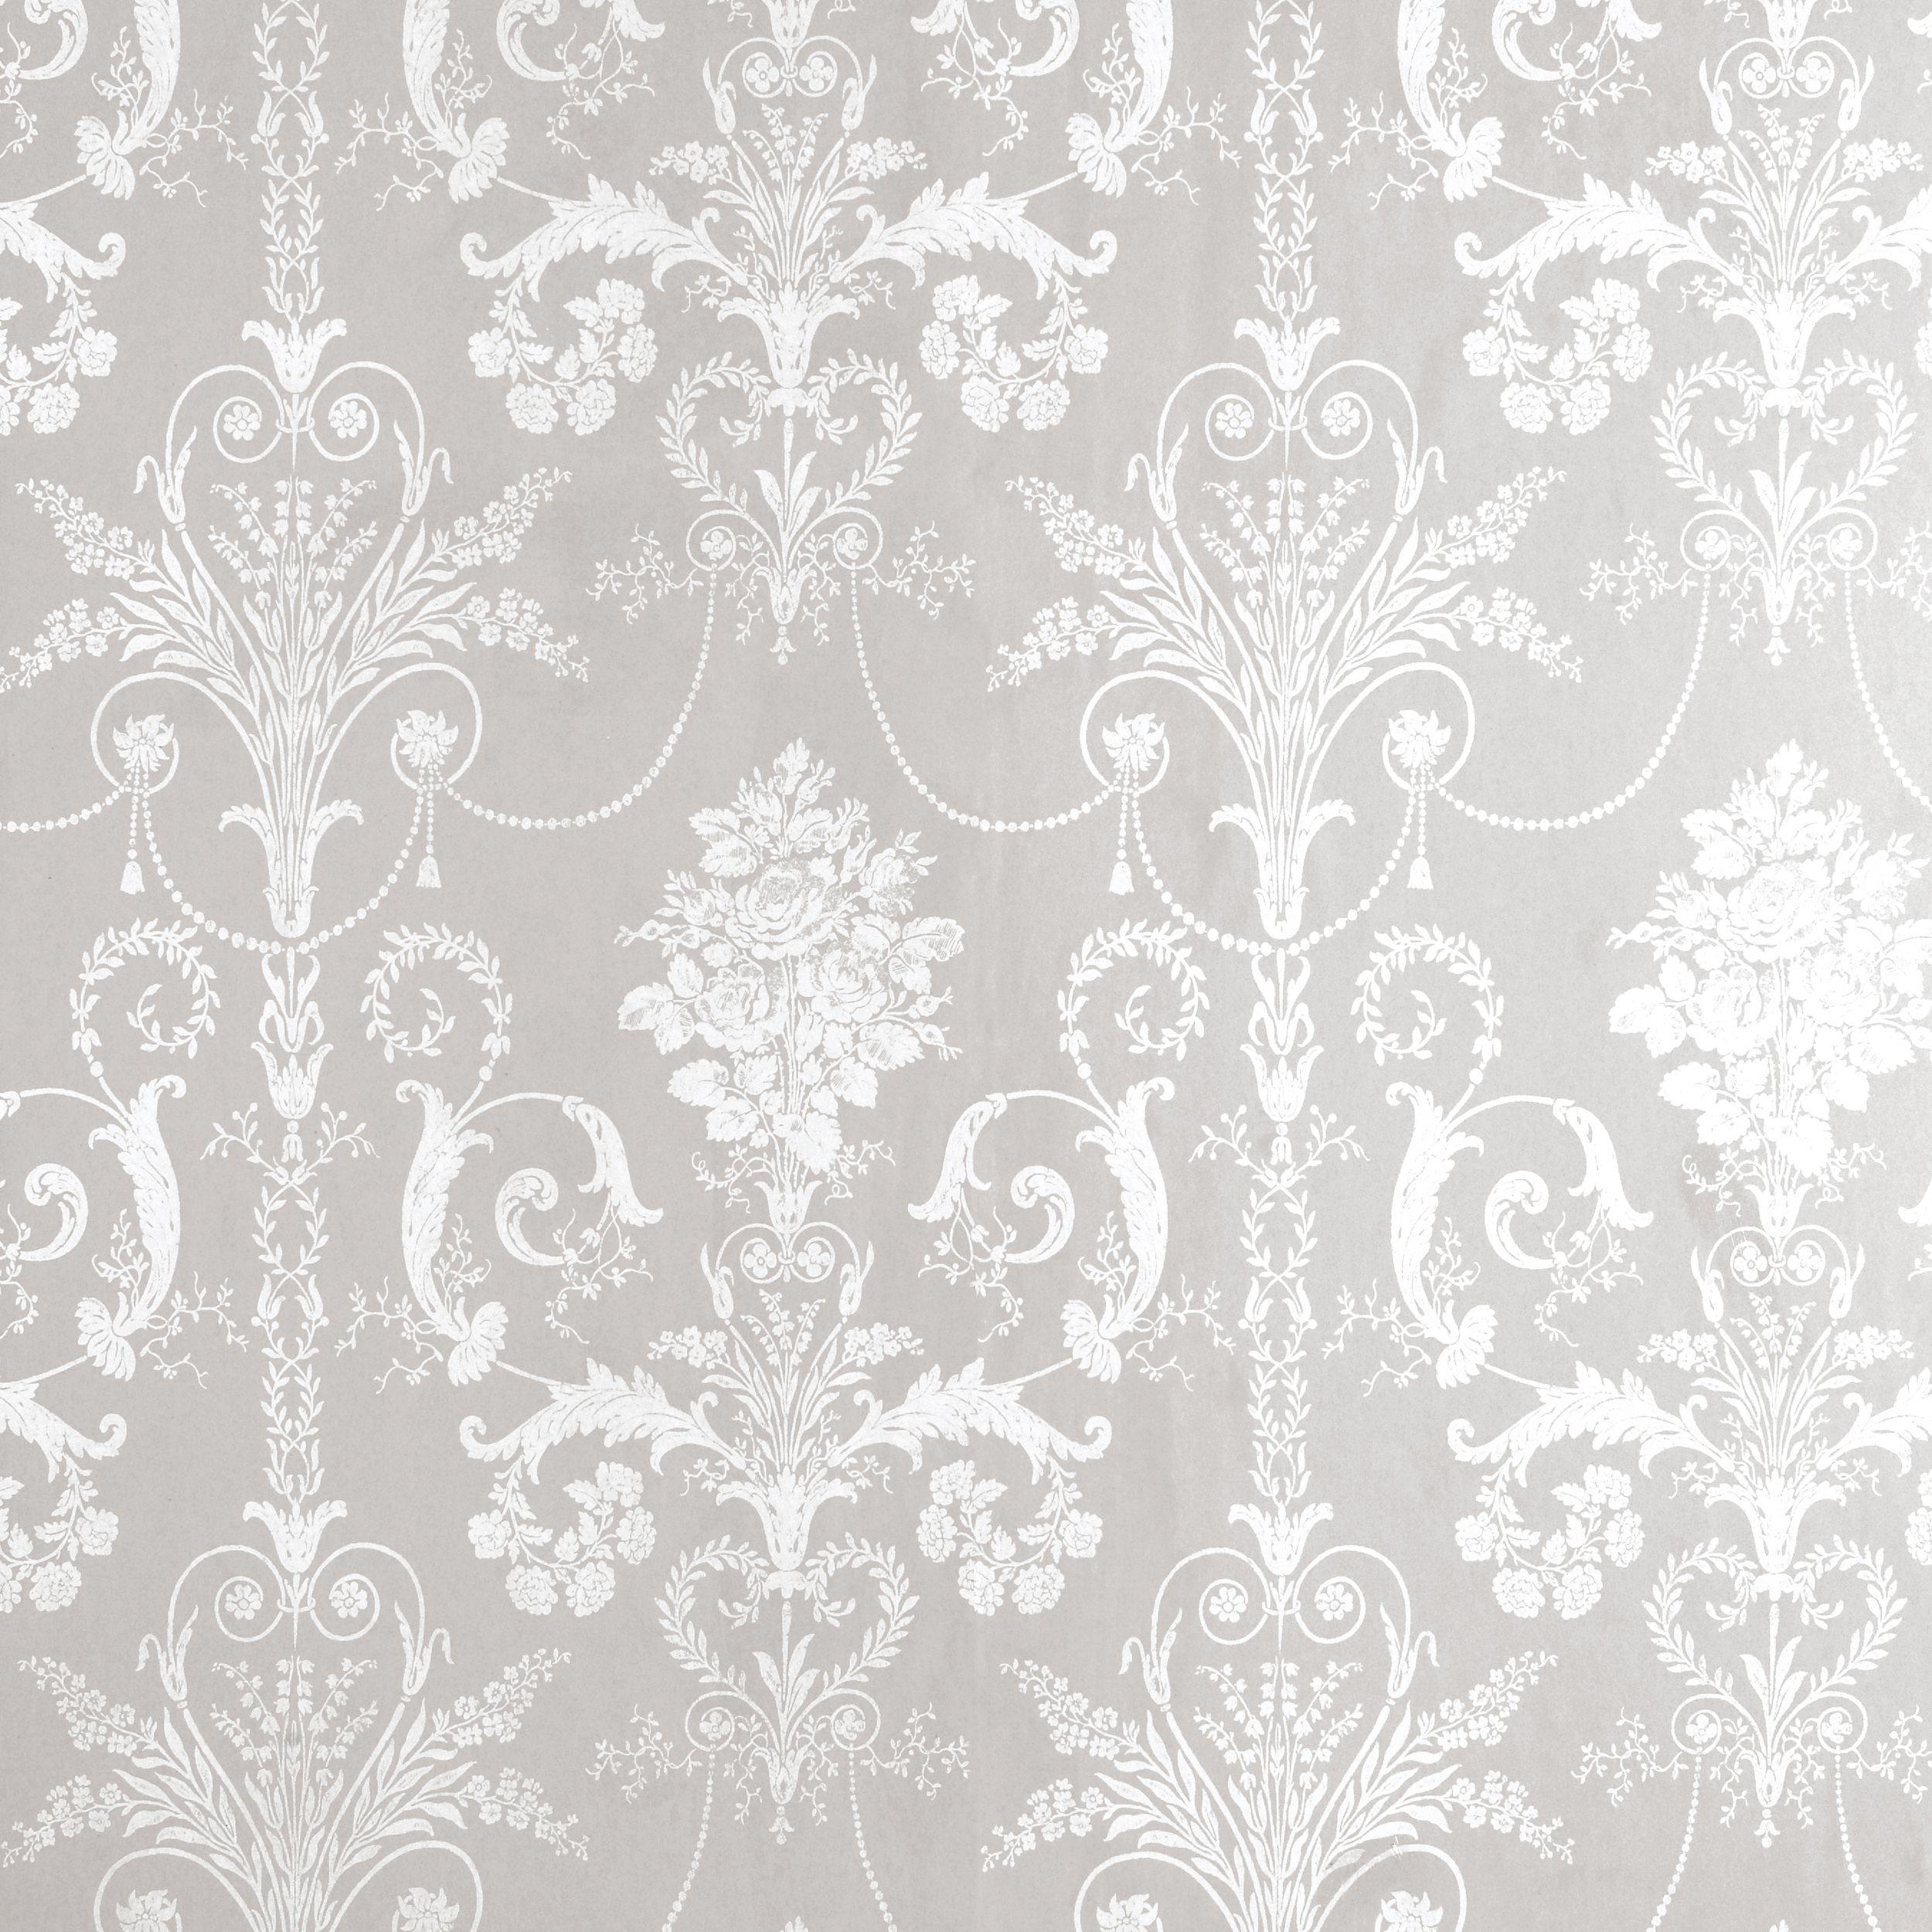 Damask Wall Paper josette white/dove grey damask wallpaper at laura ashley | טפטים